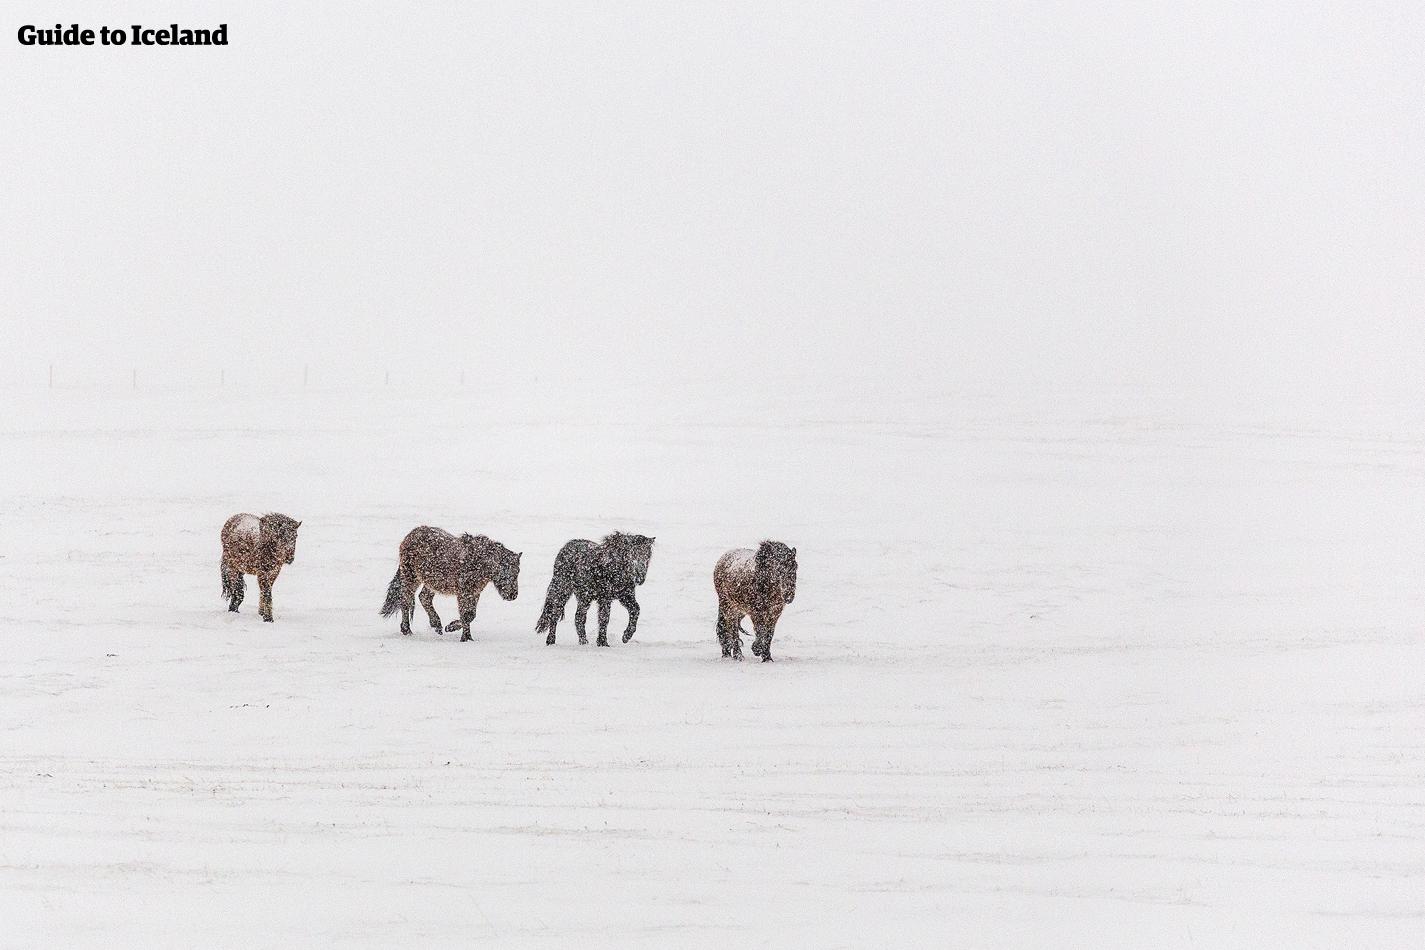 Island i desember | En uslåelig guide